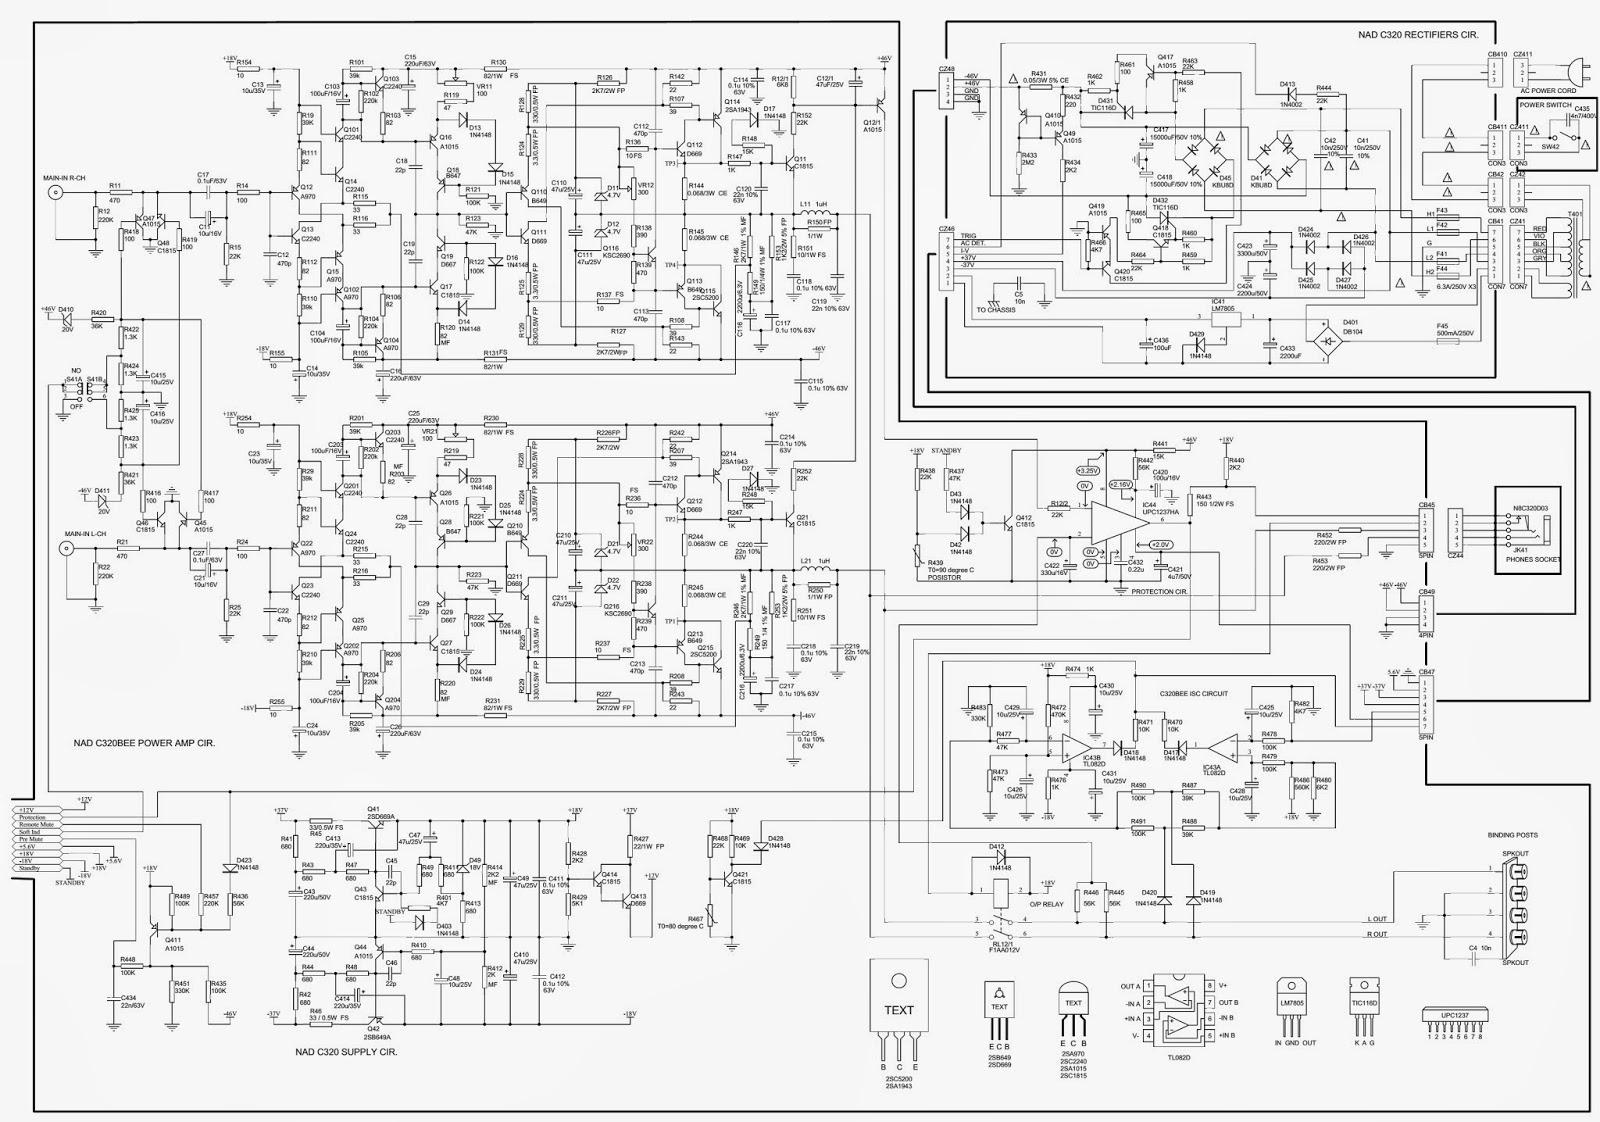 2sc5200 power amp circuit diagram